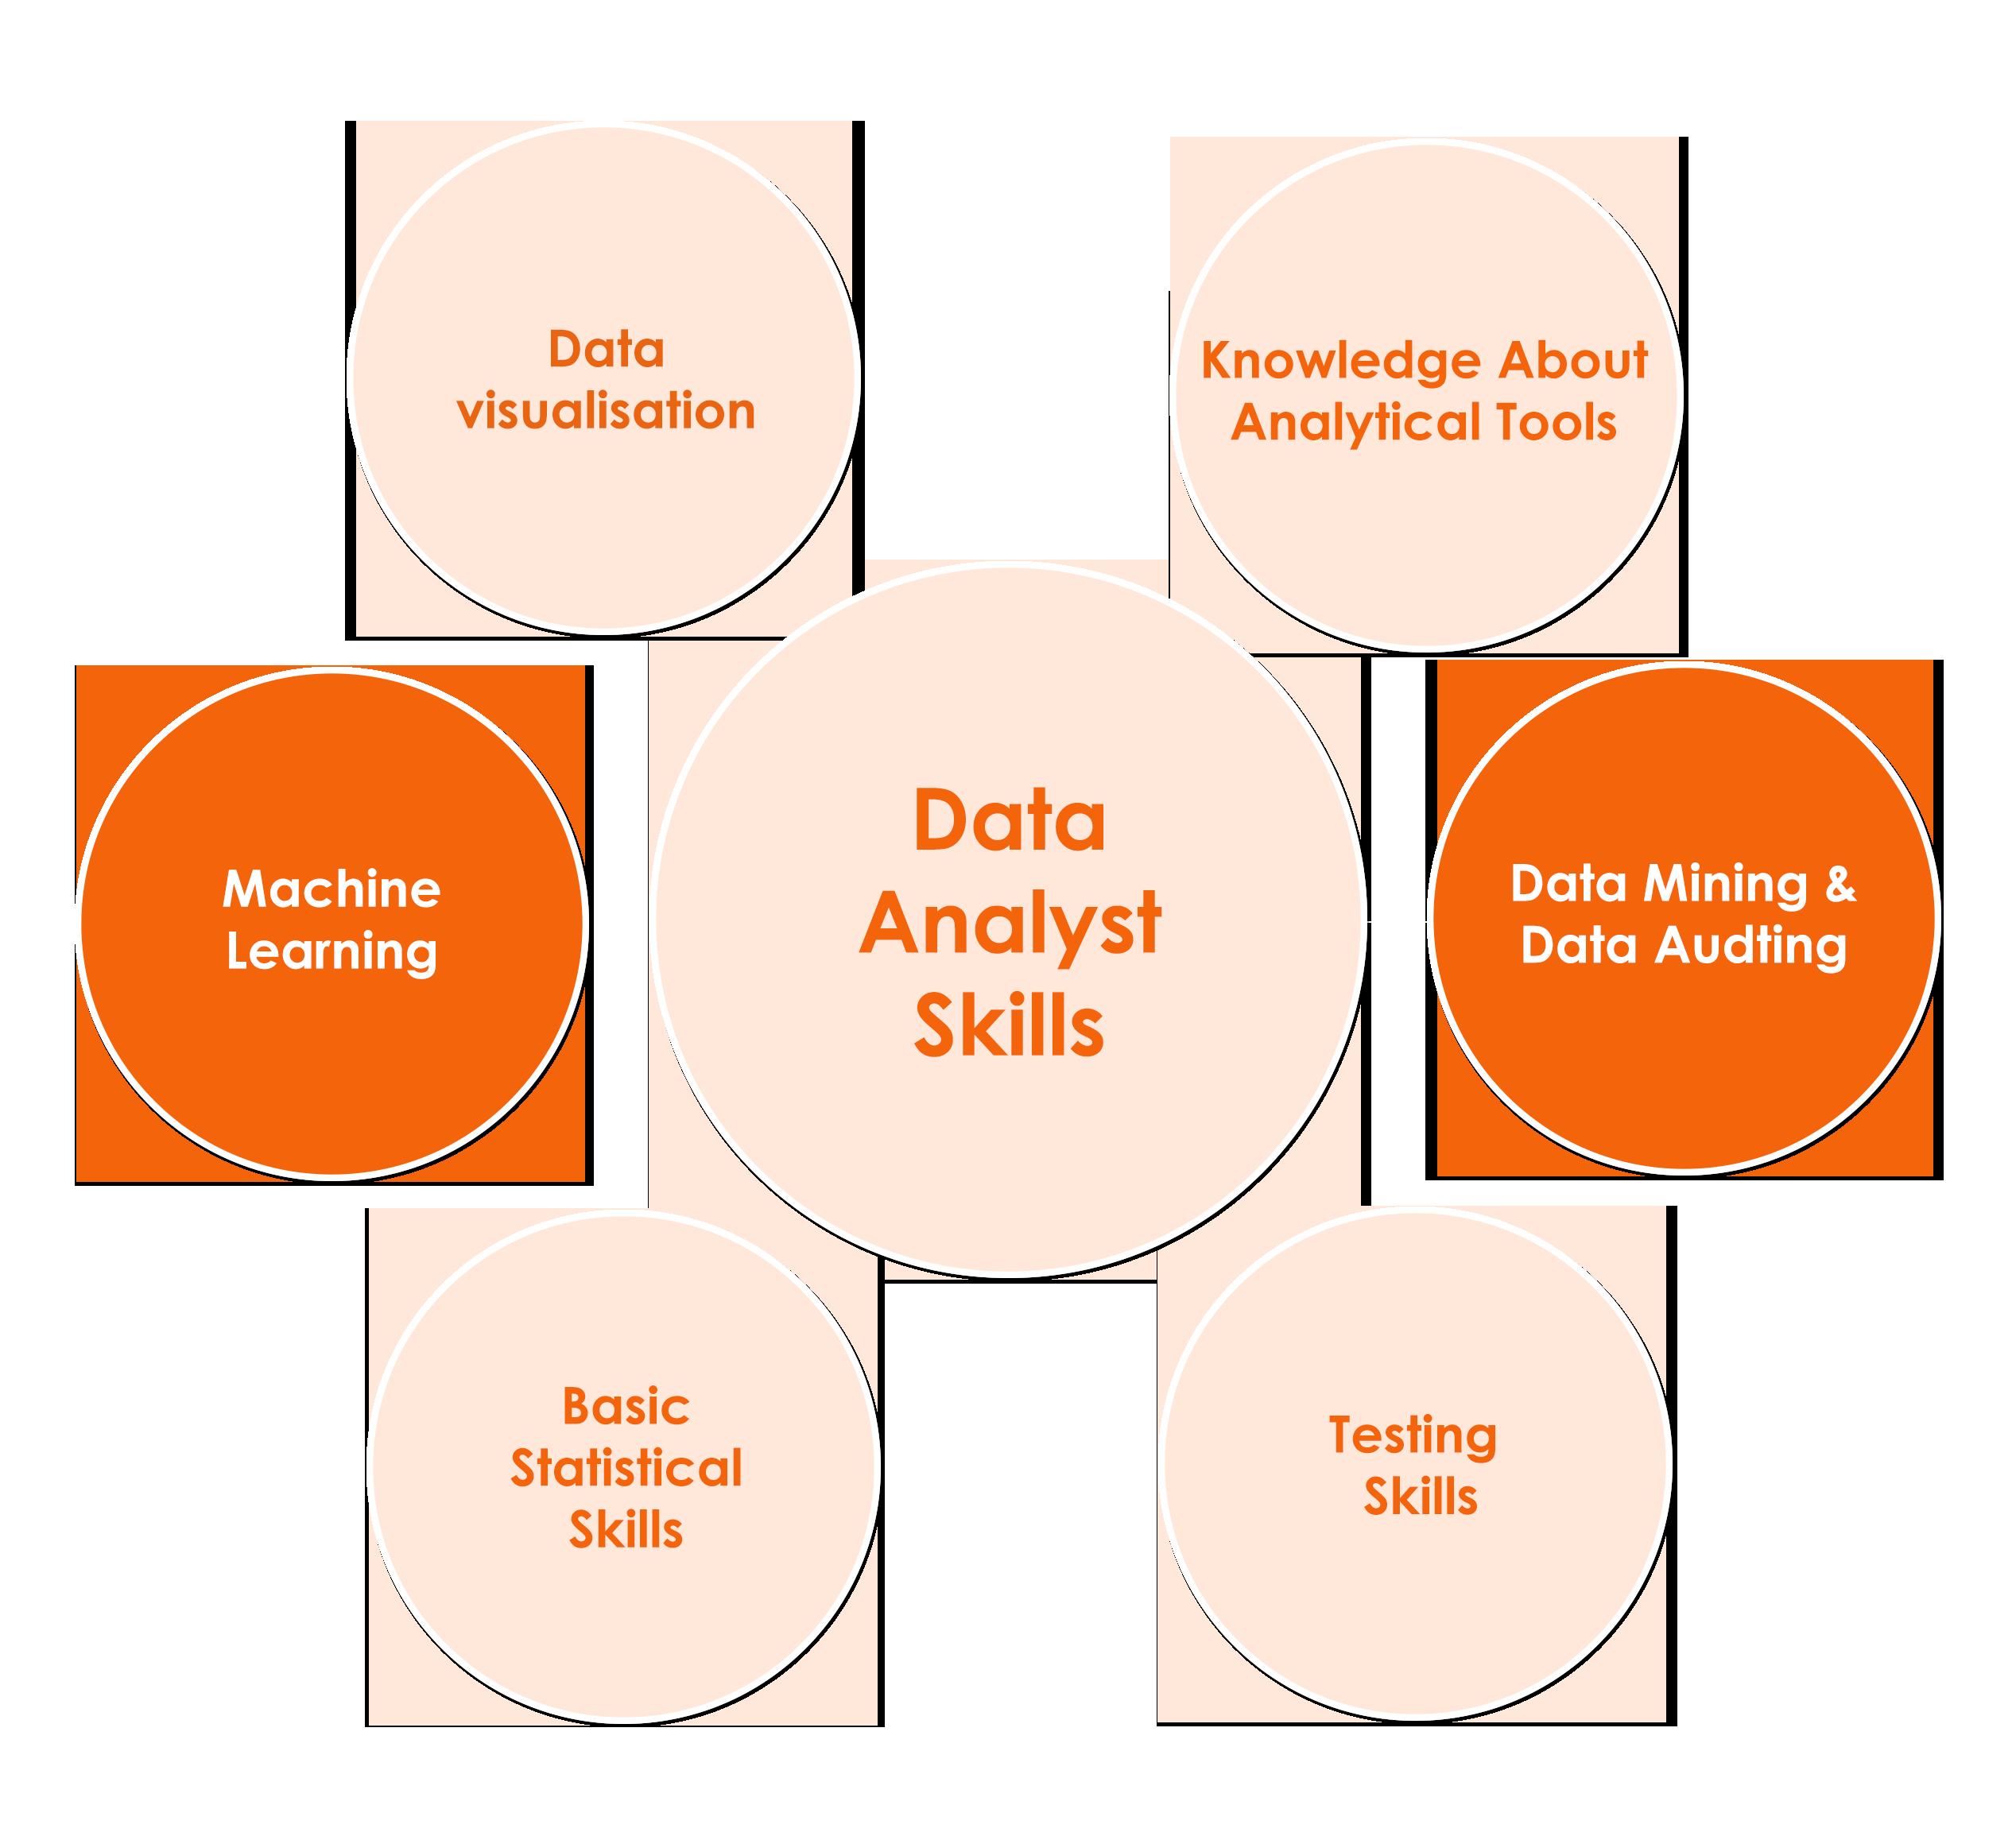 Political Data Analyst Skills